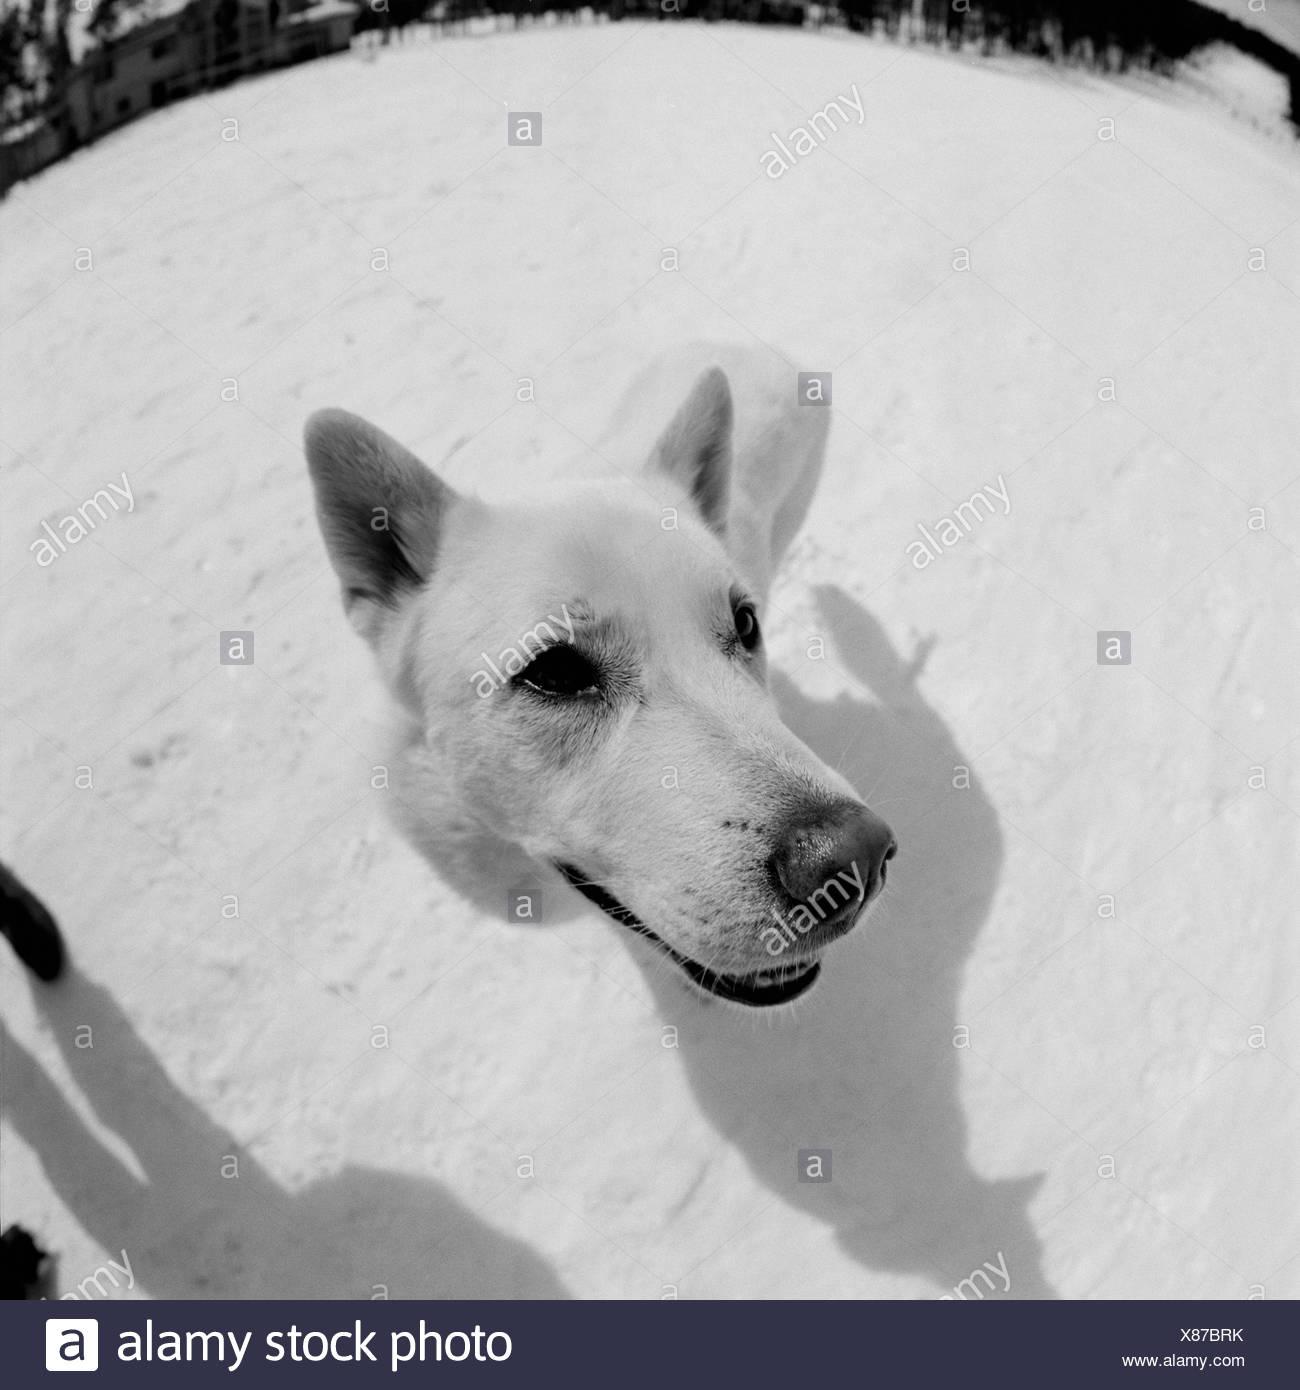 High angle view of a dog - Stock Image